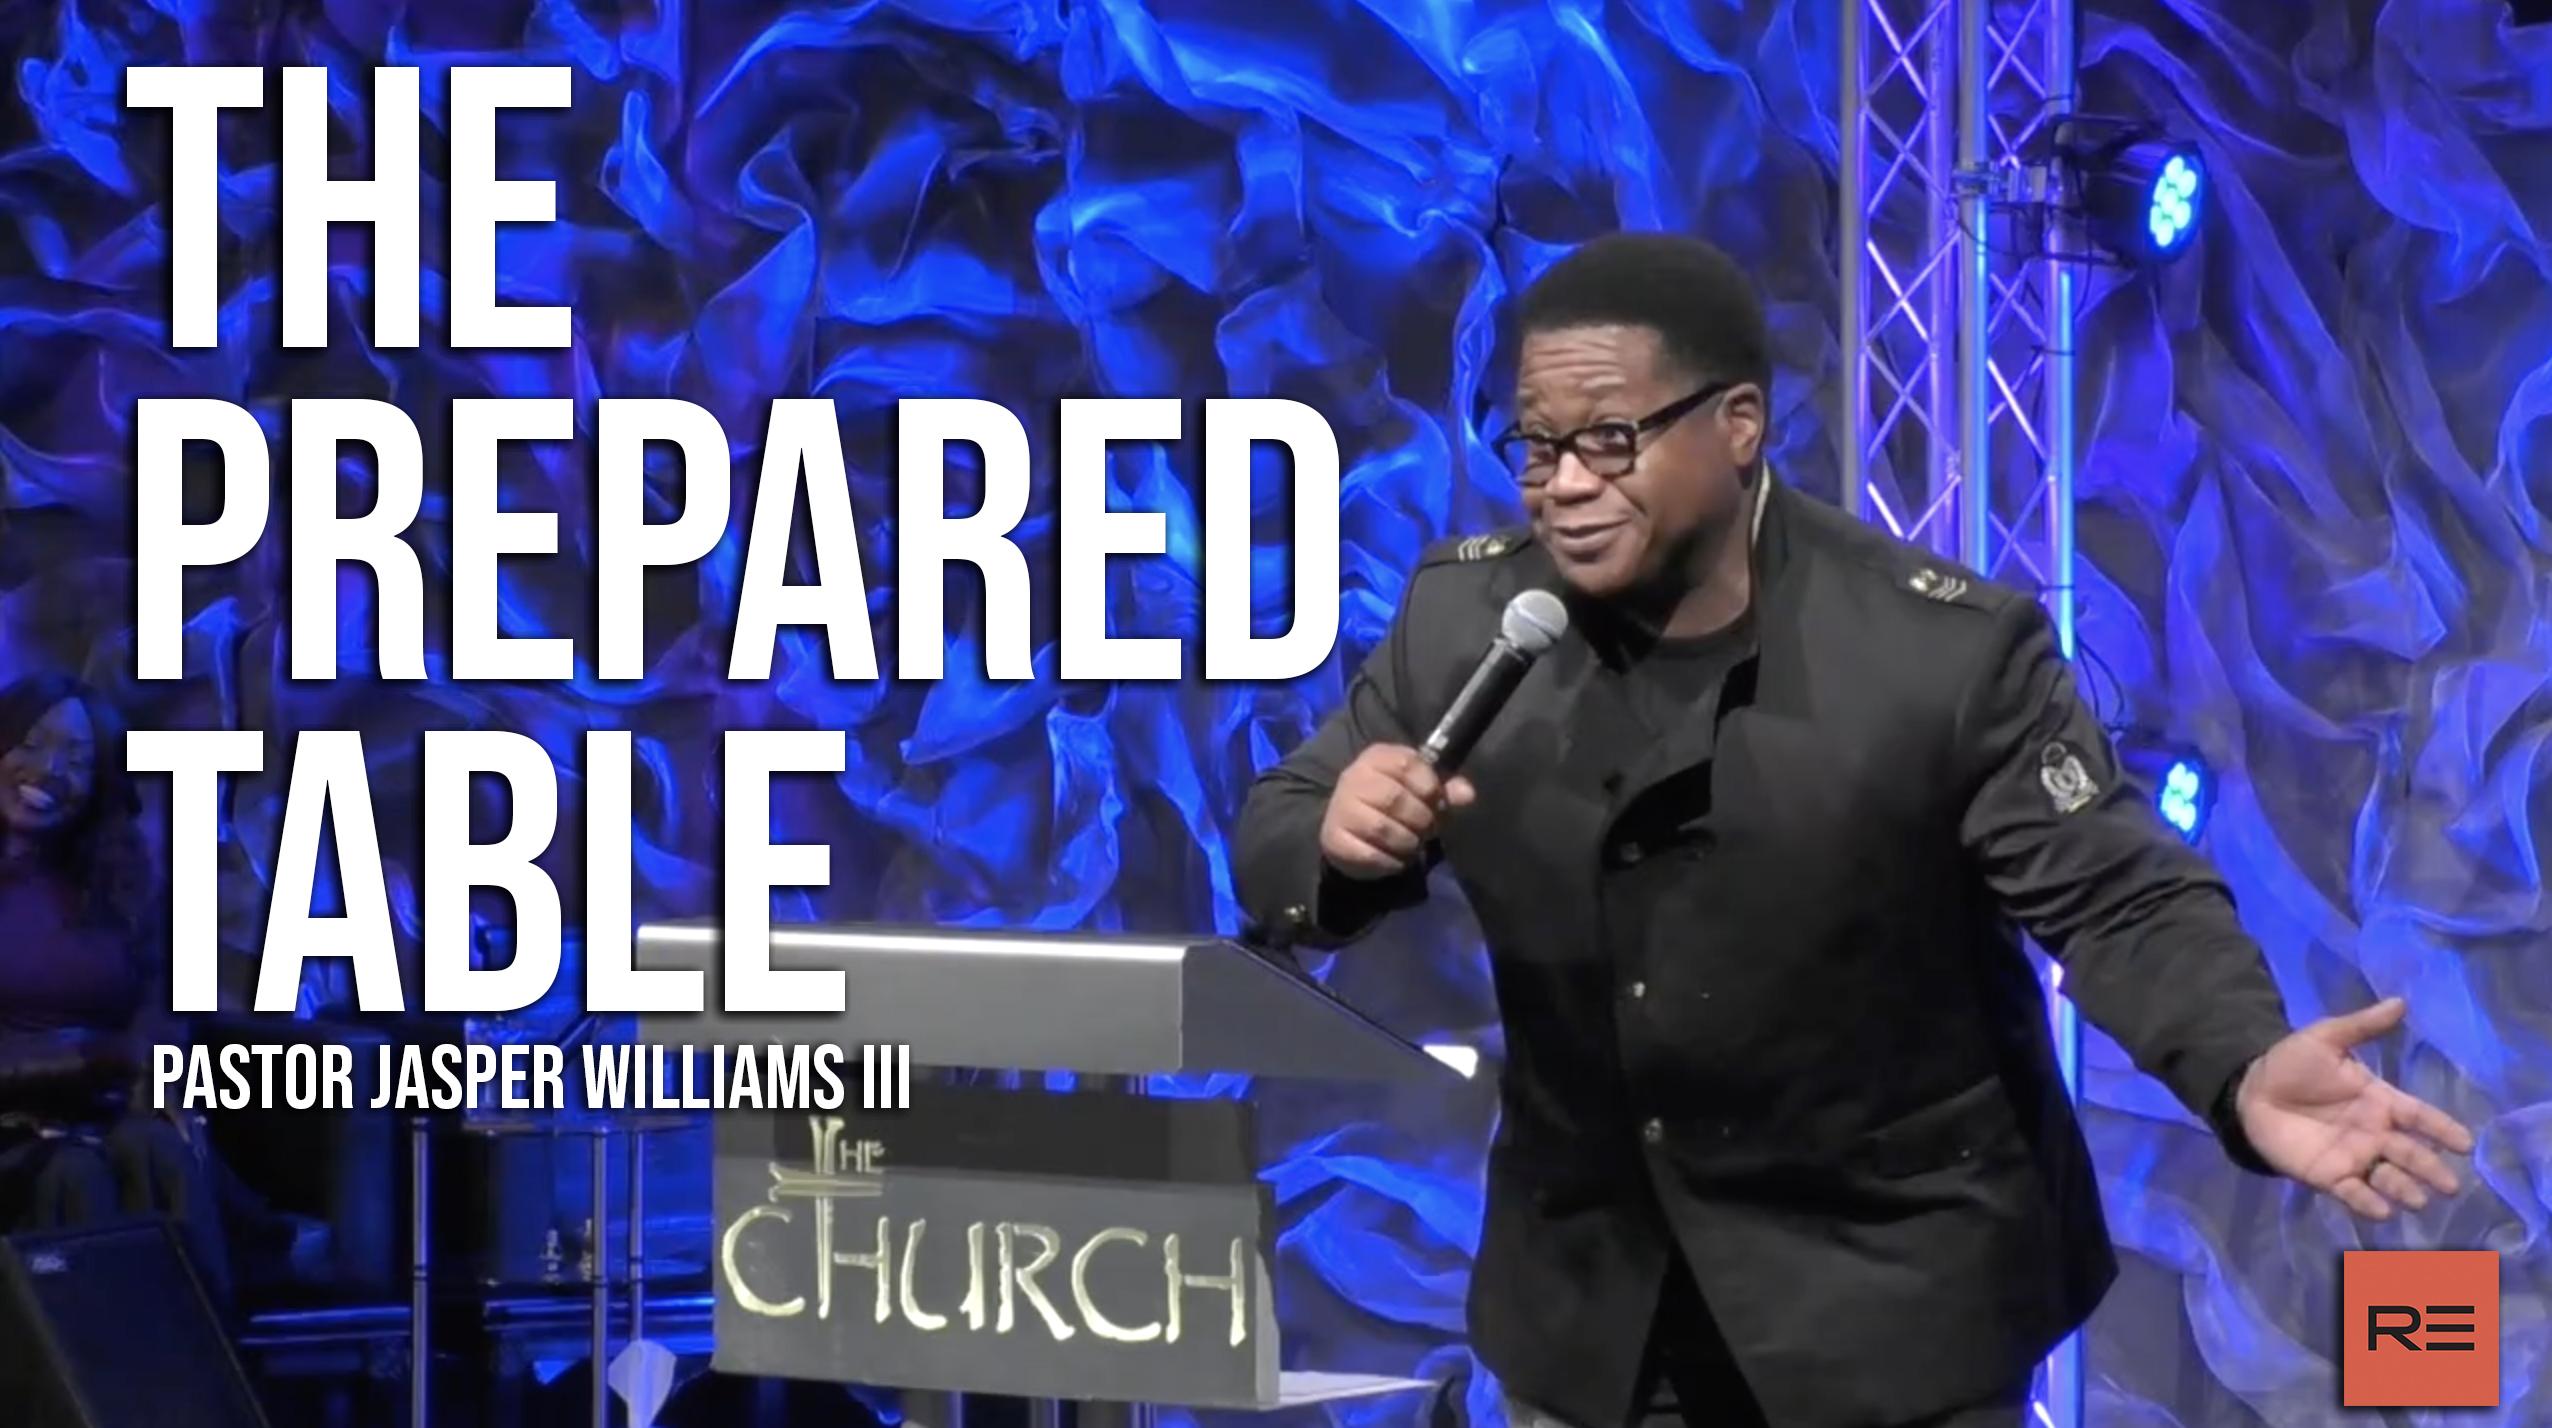 The Prepared Table | Pastor Jasper Williams III